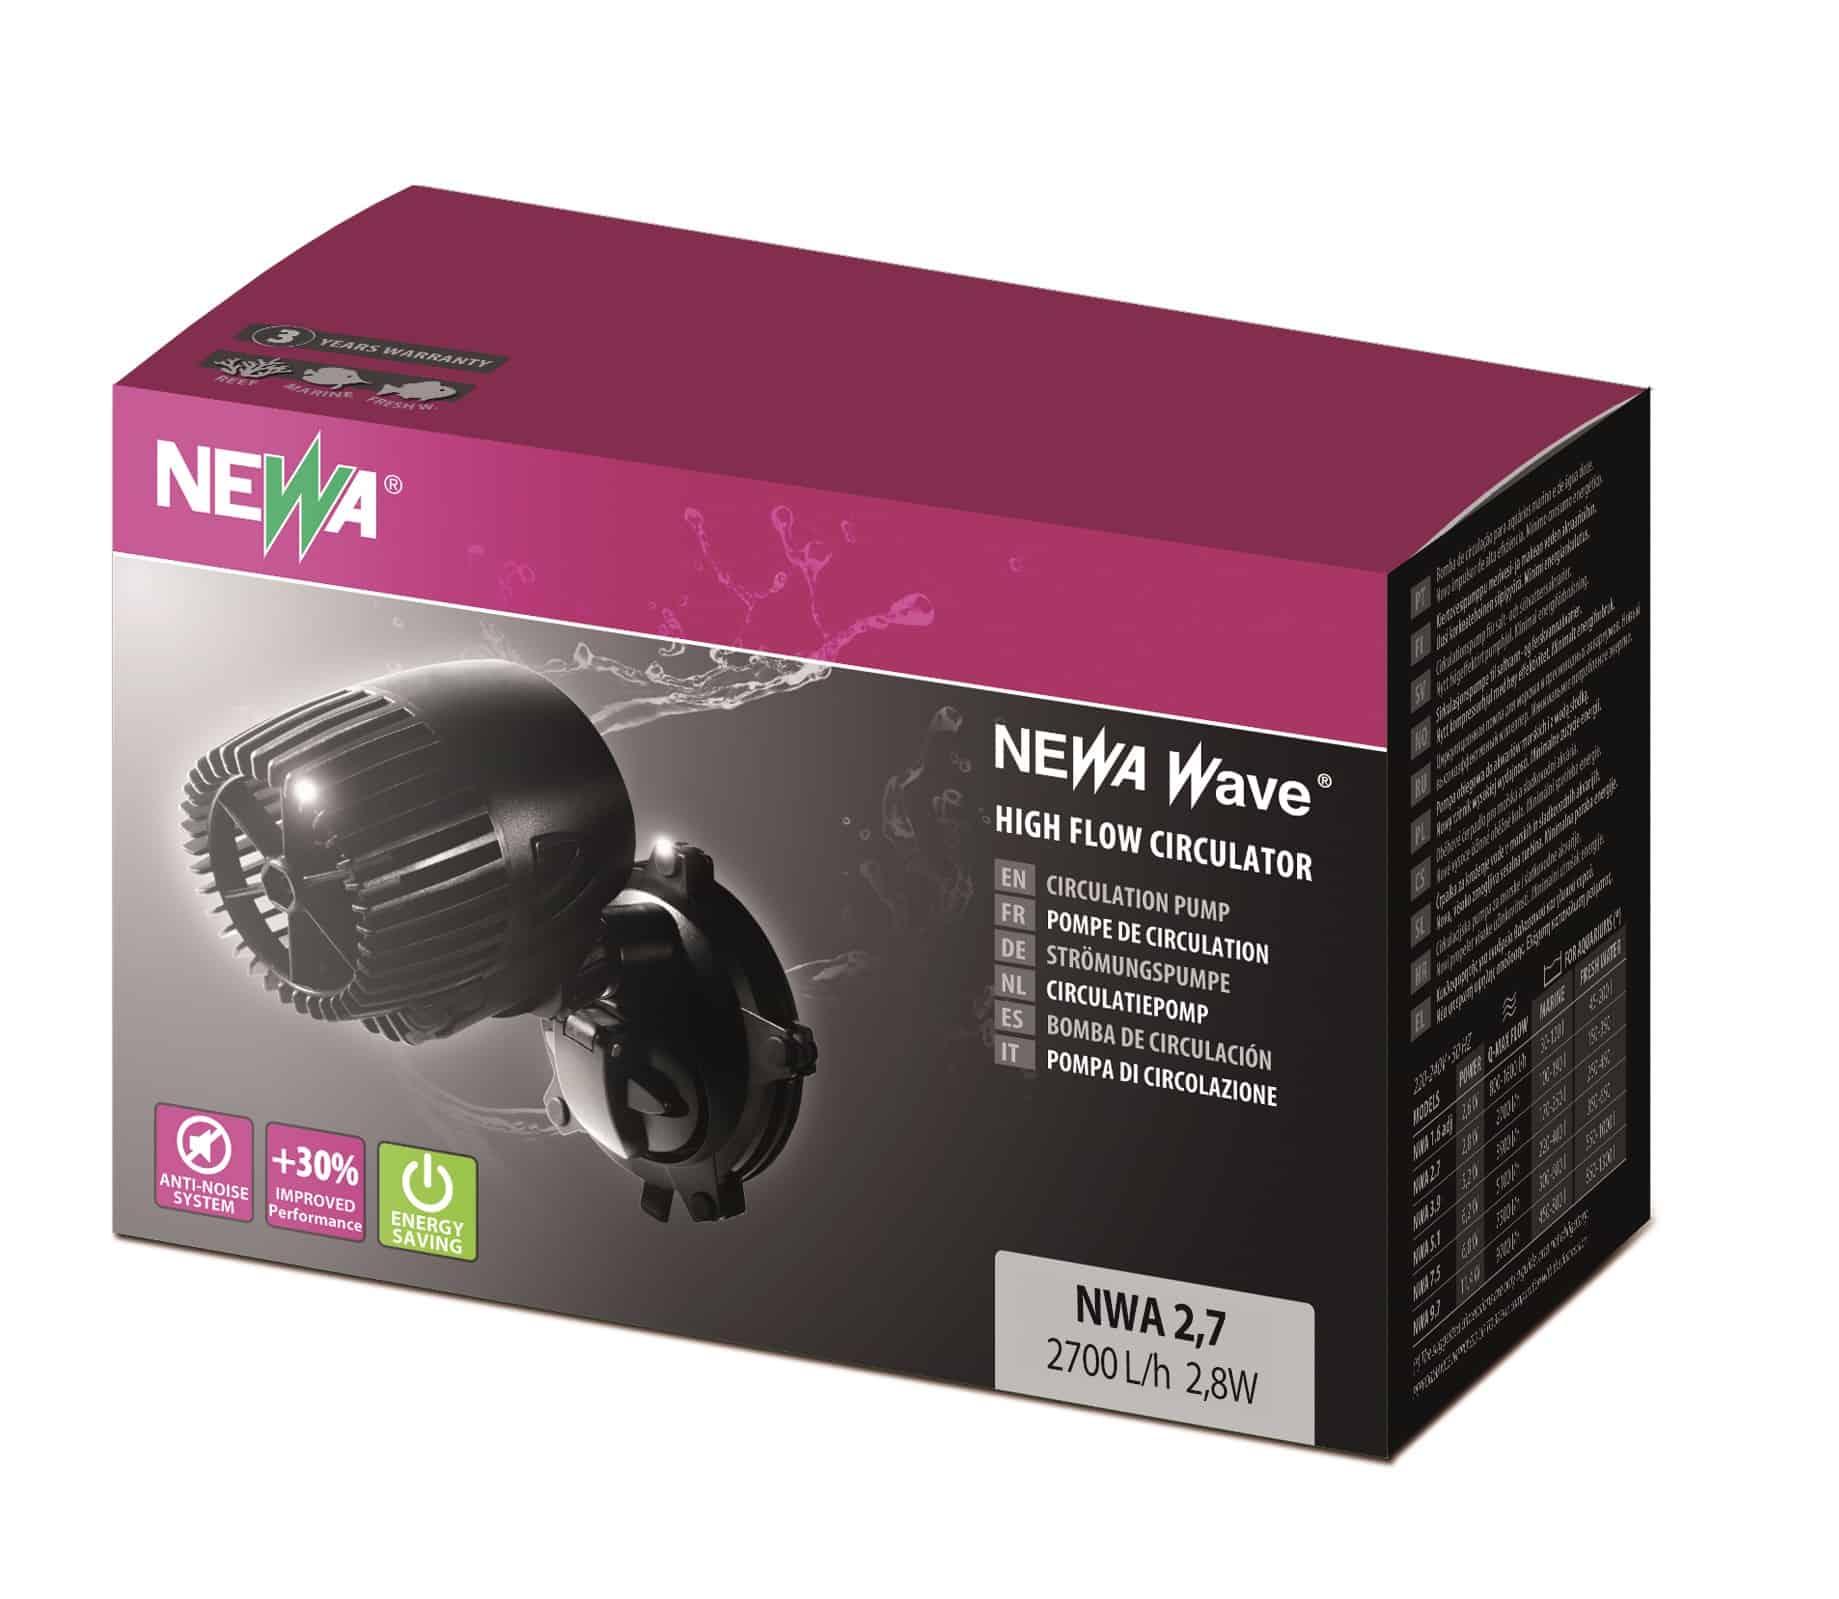 newa-wave-nwa-2-7-pompe-de-brassage-aquarium-min